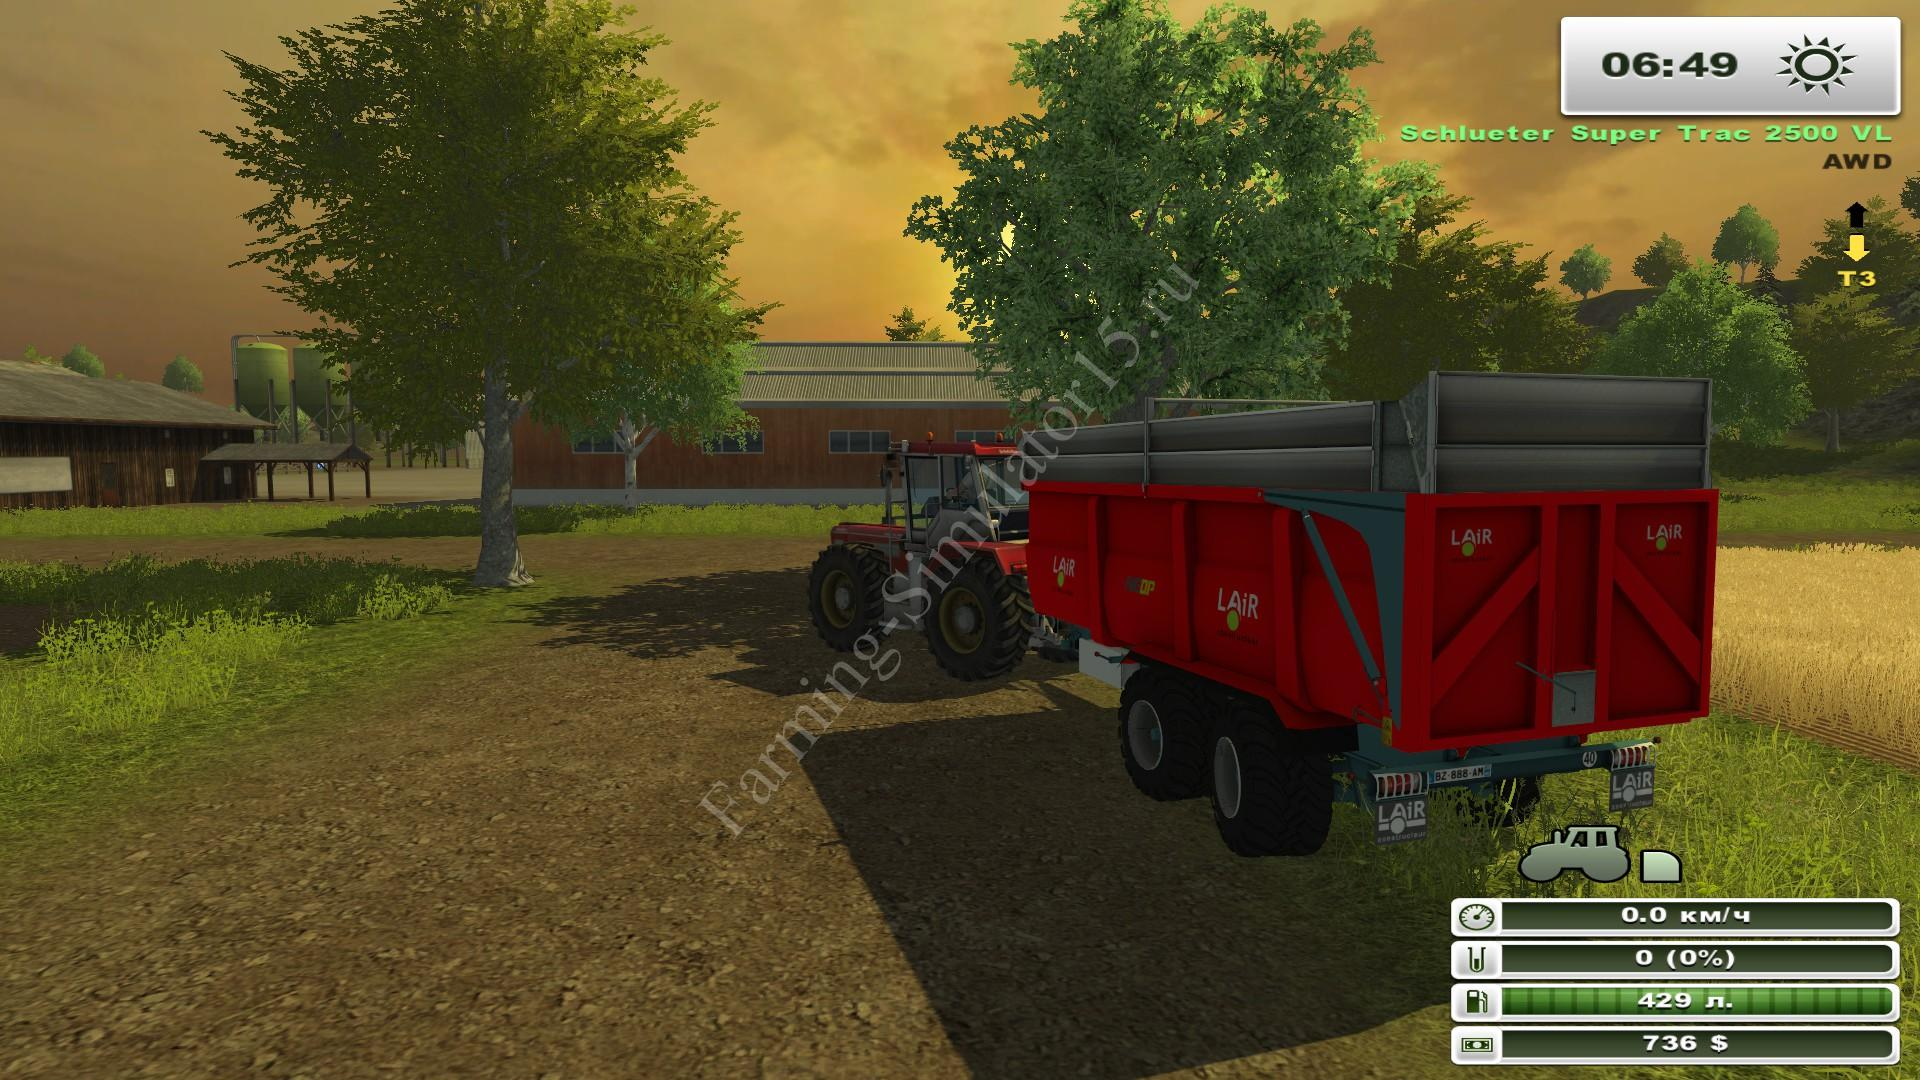 Мод прицепа Benne Lair v 1.0 More Realistic, Farming Simulator 2013, Farming Simulator 13